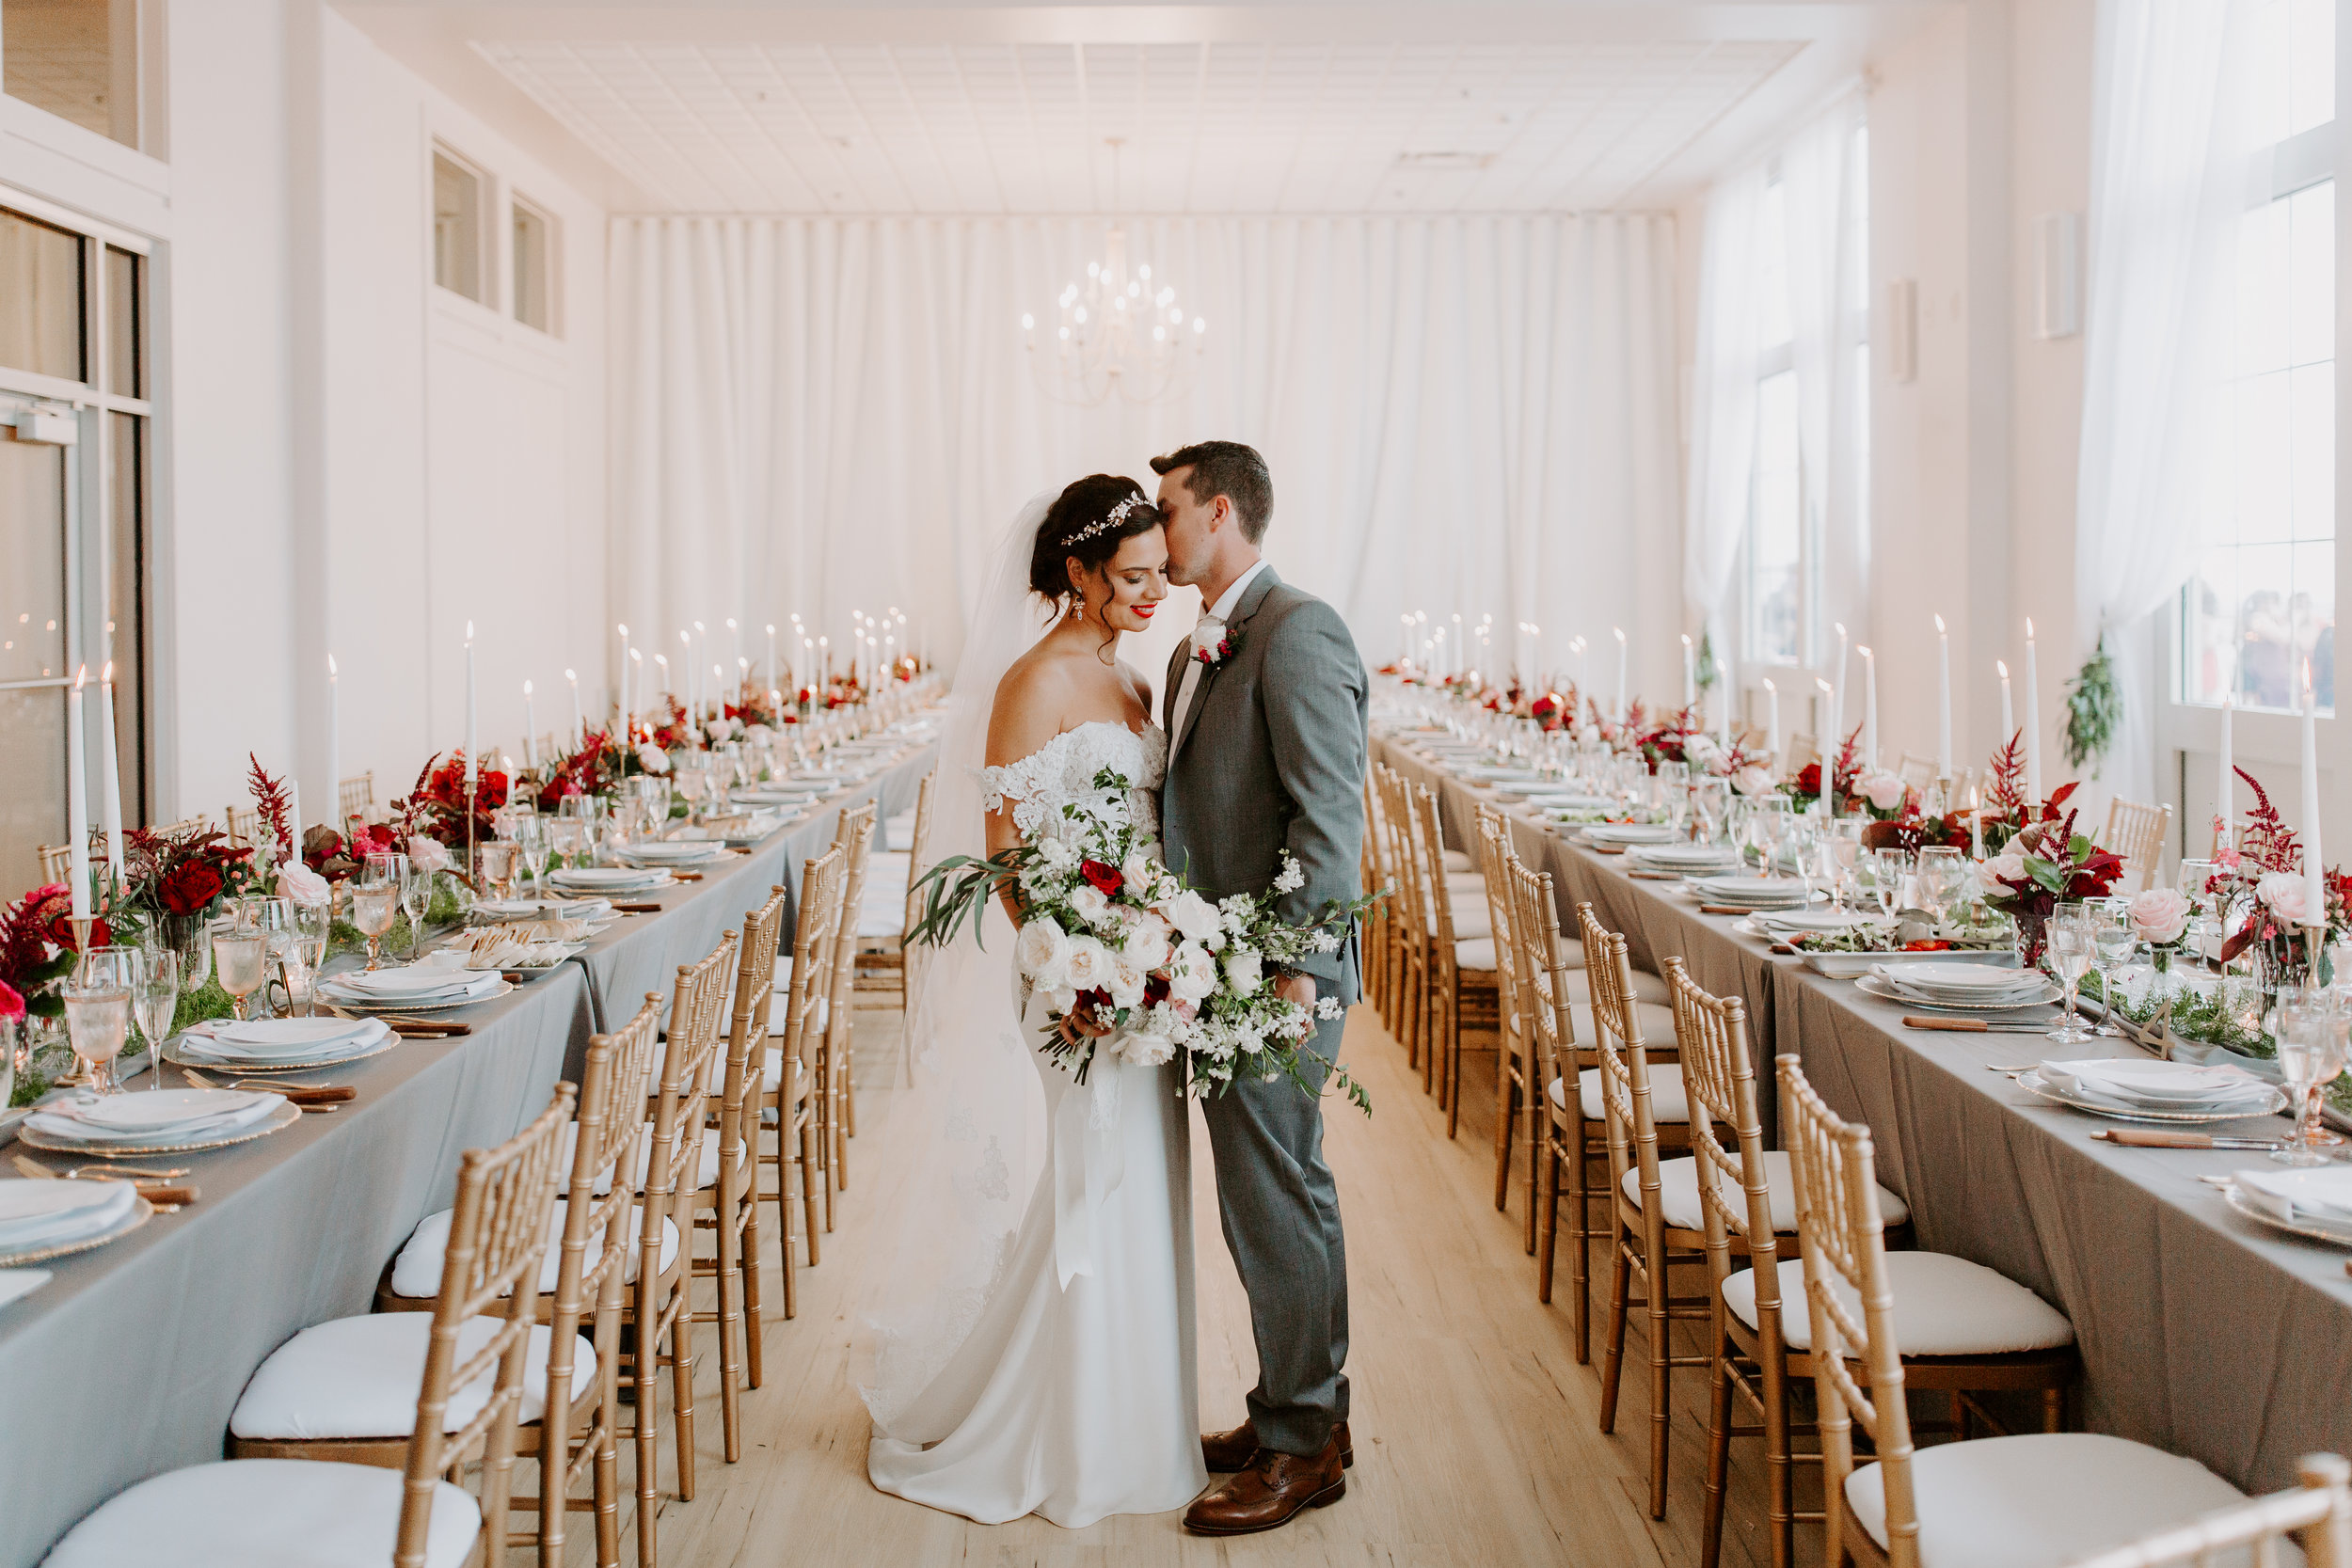 Brandi Toole Photography - Wedding 550.jpg